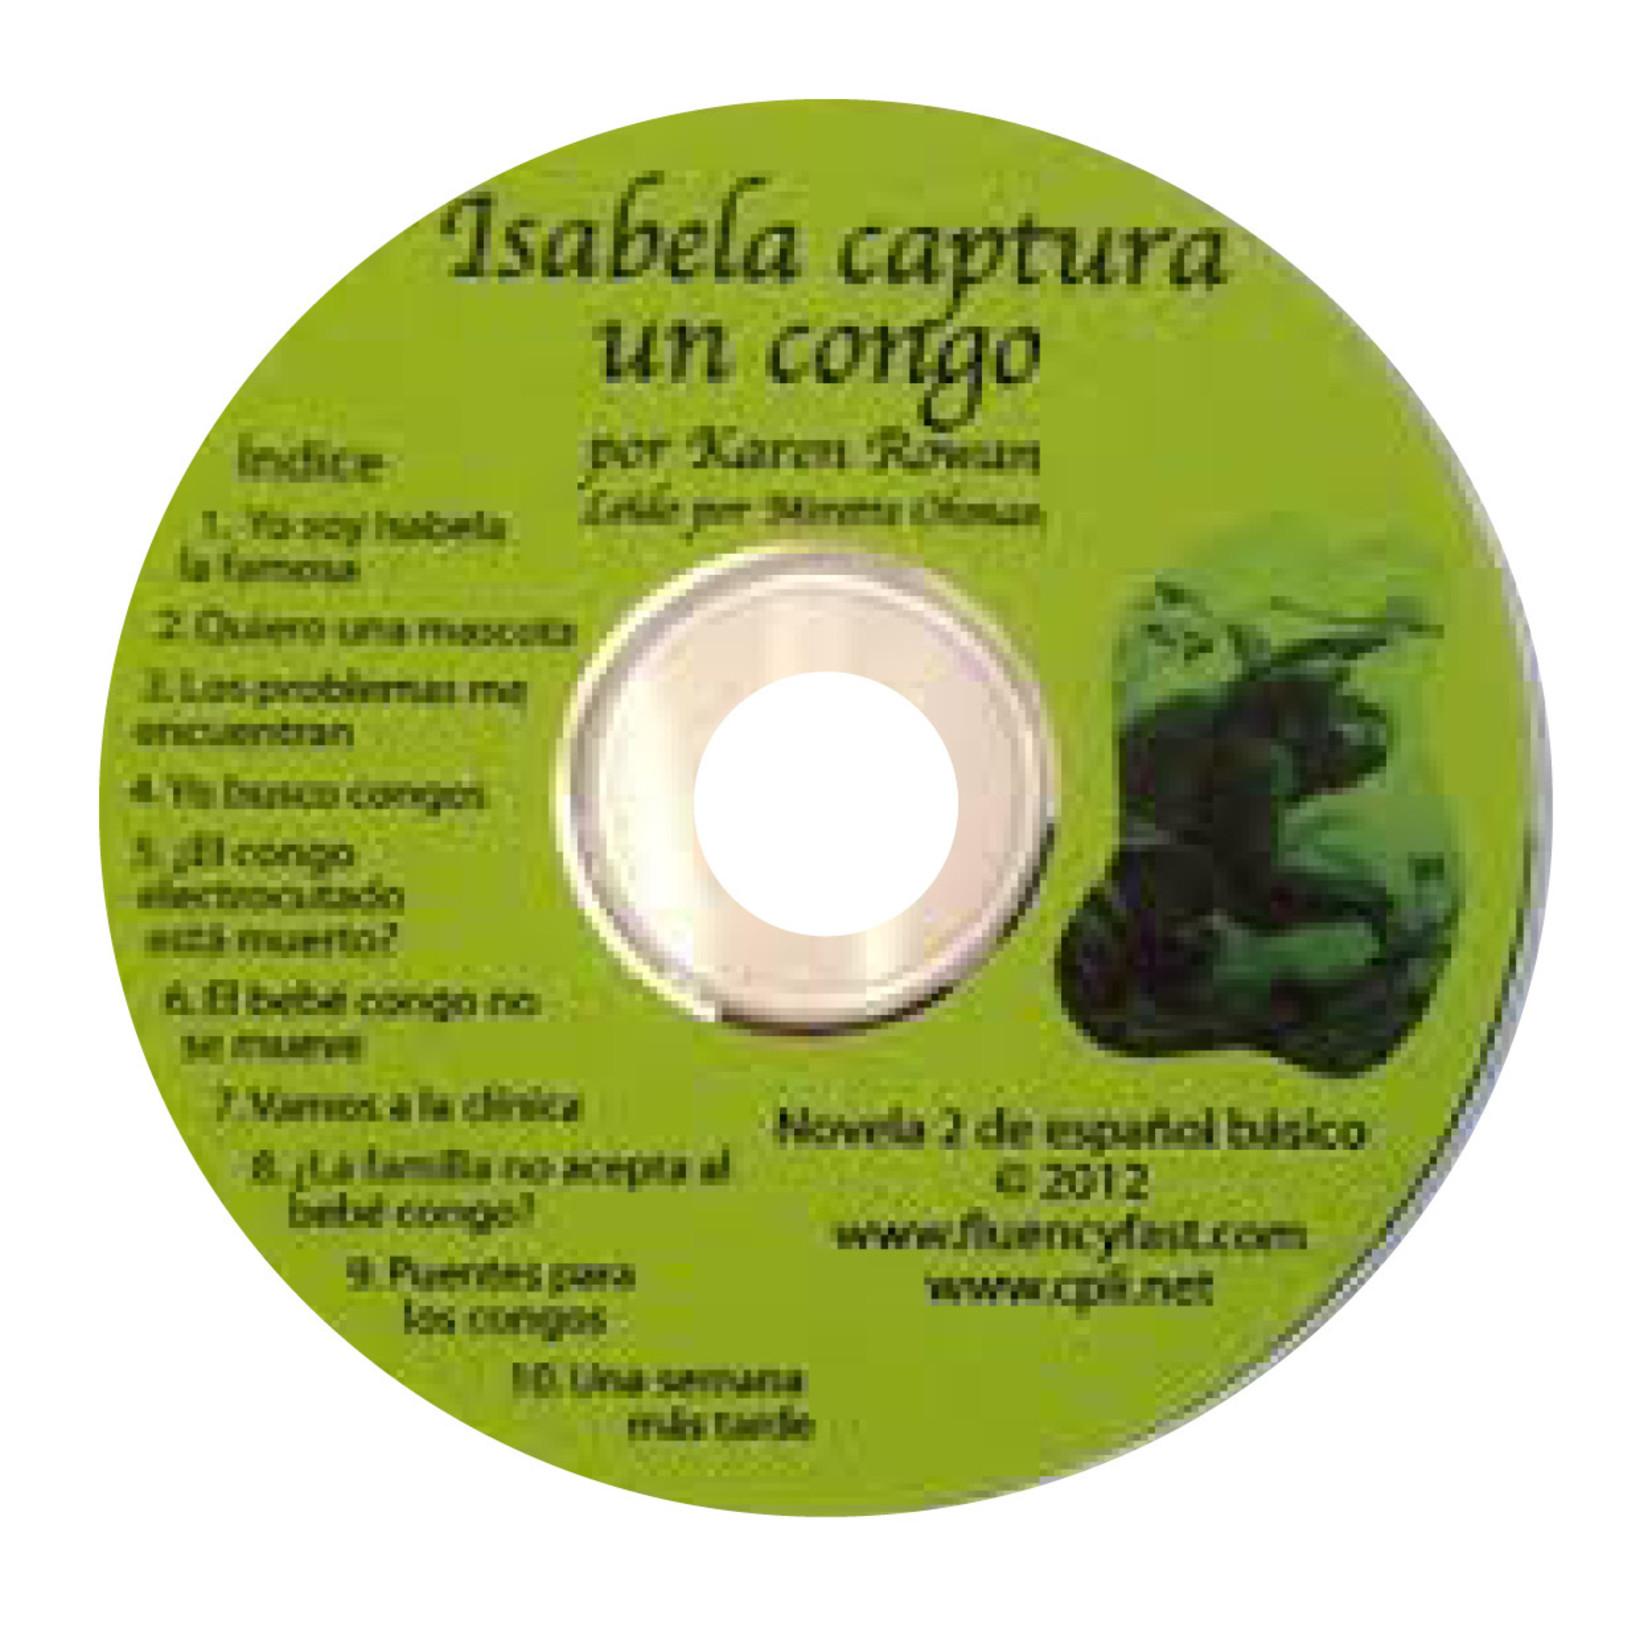 Command Performance Books Isabela captura un congo - Audiobook